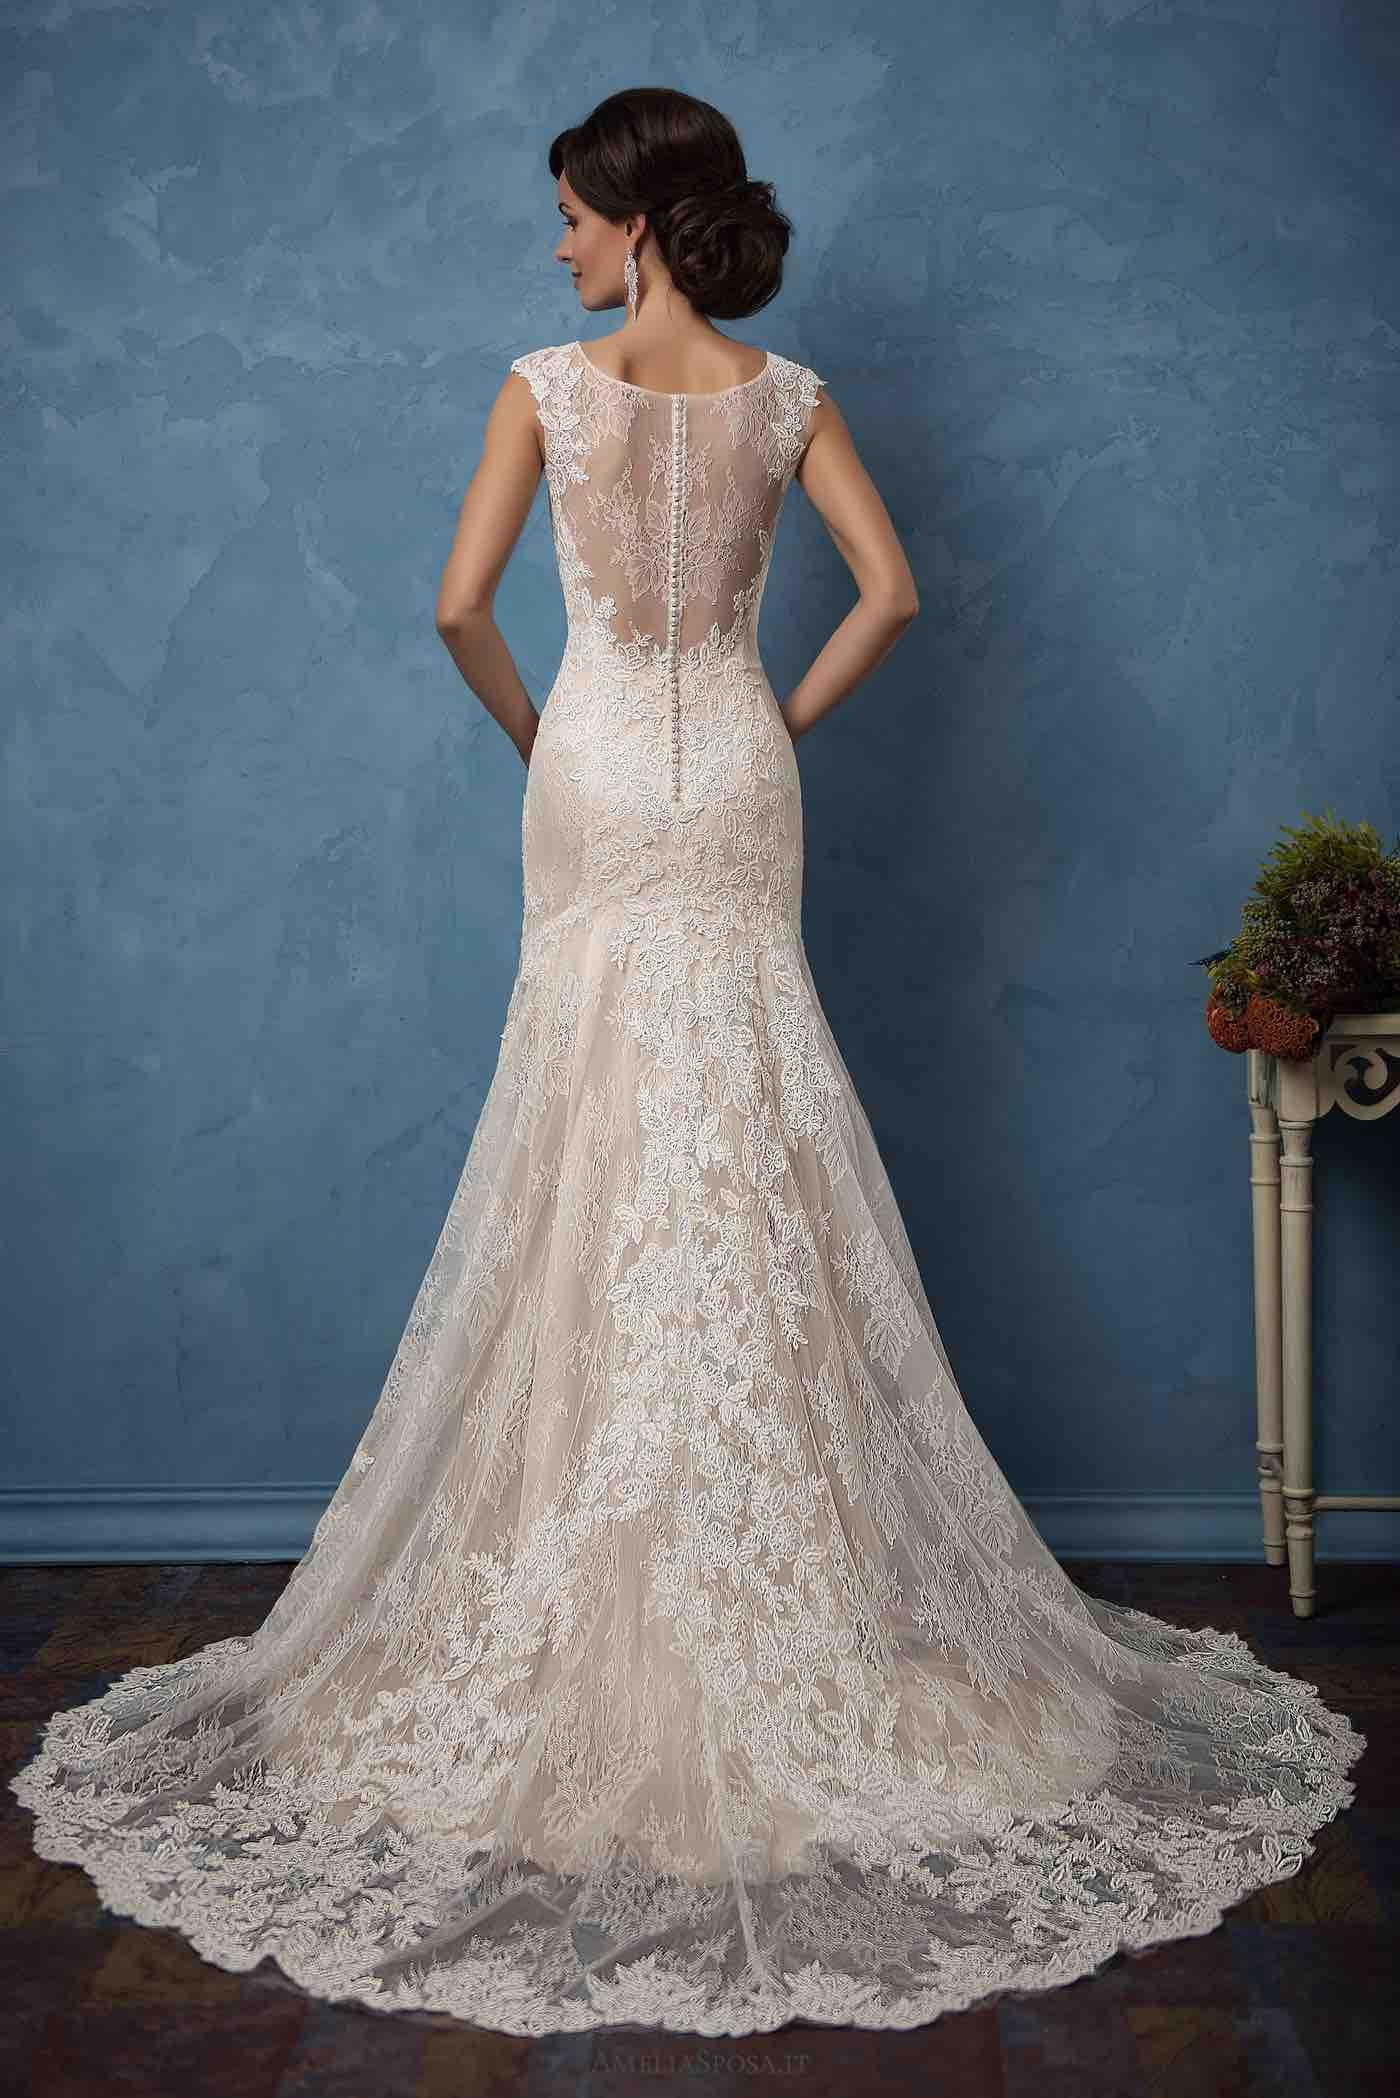 Wedding dress inspiration amelia sposa amelia sposa amelia and